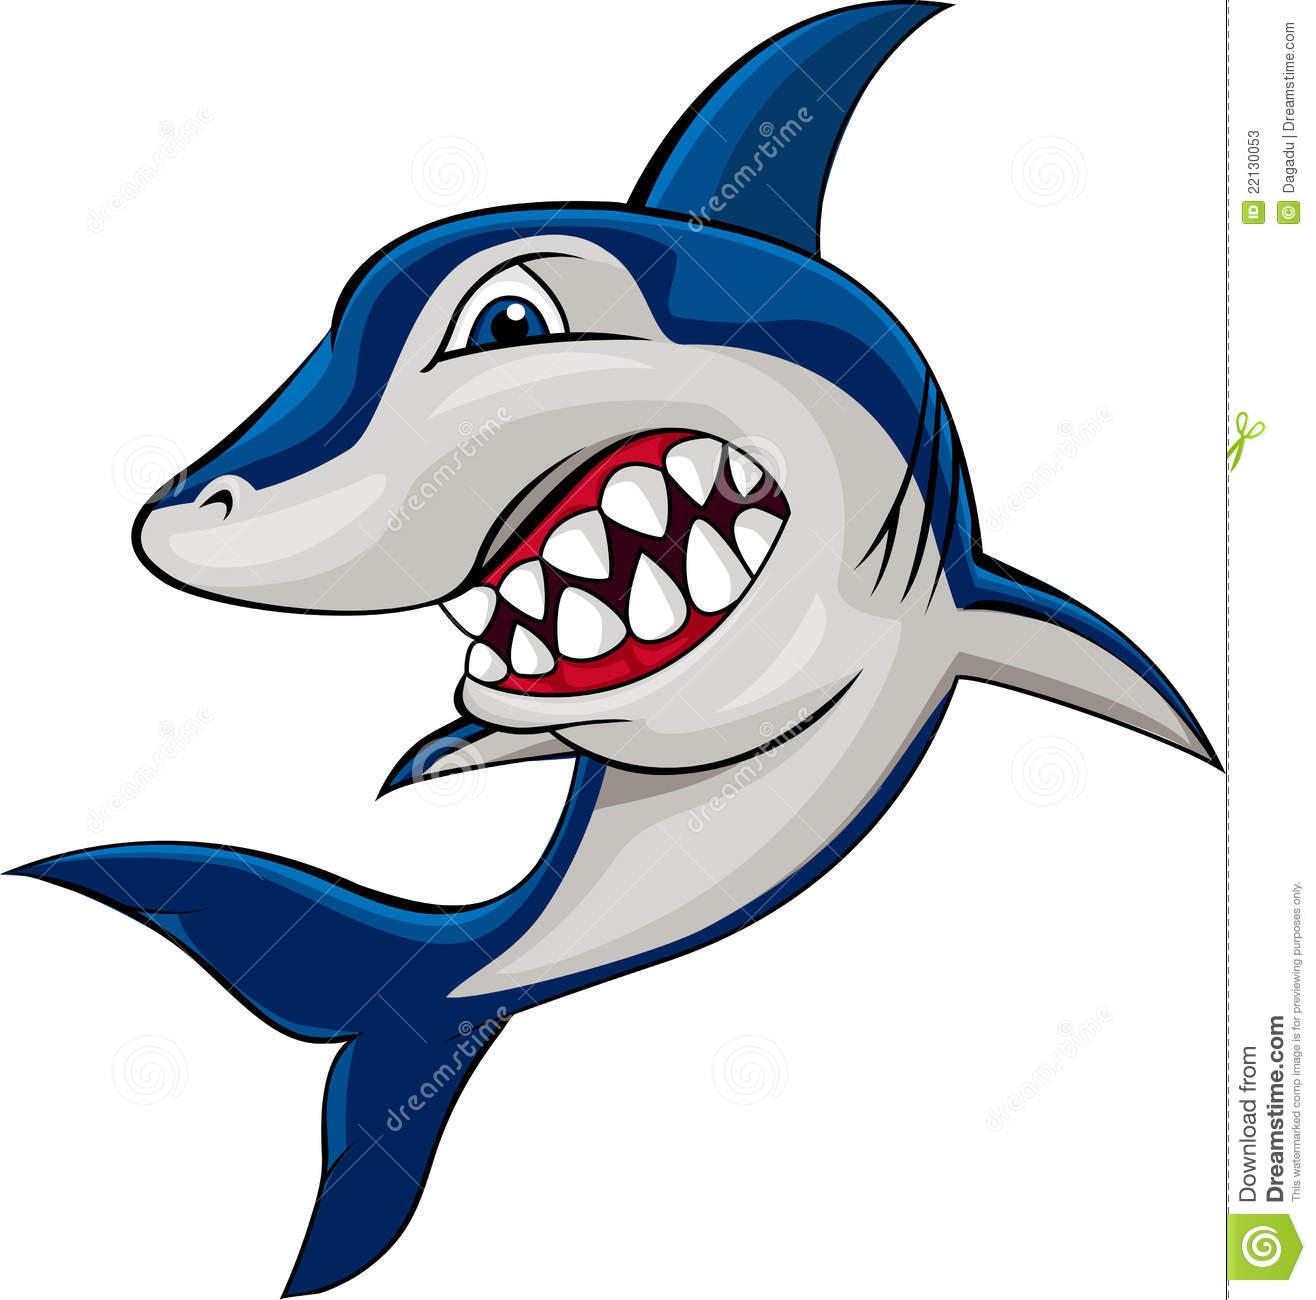 Shark clipart #15, Download drawings